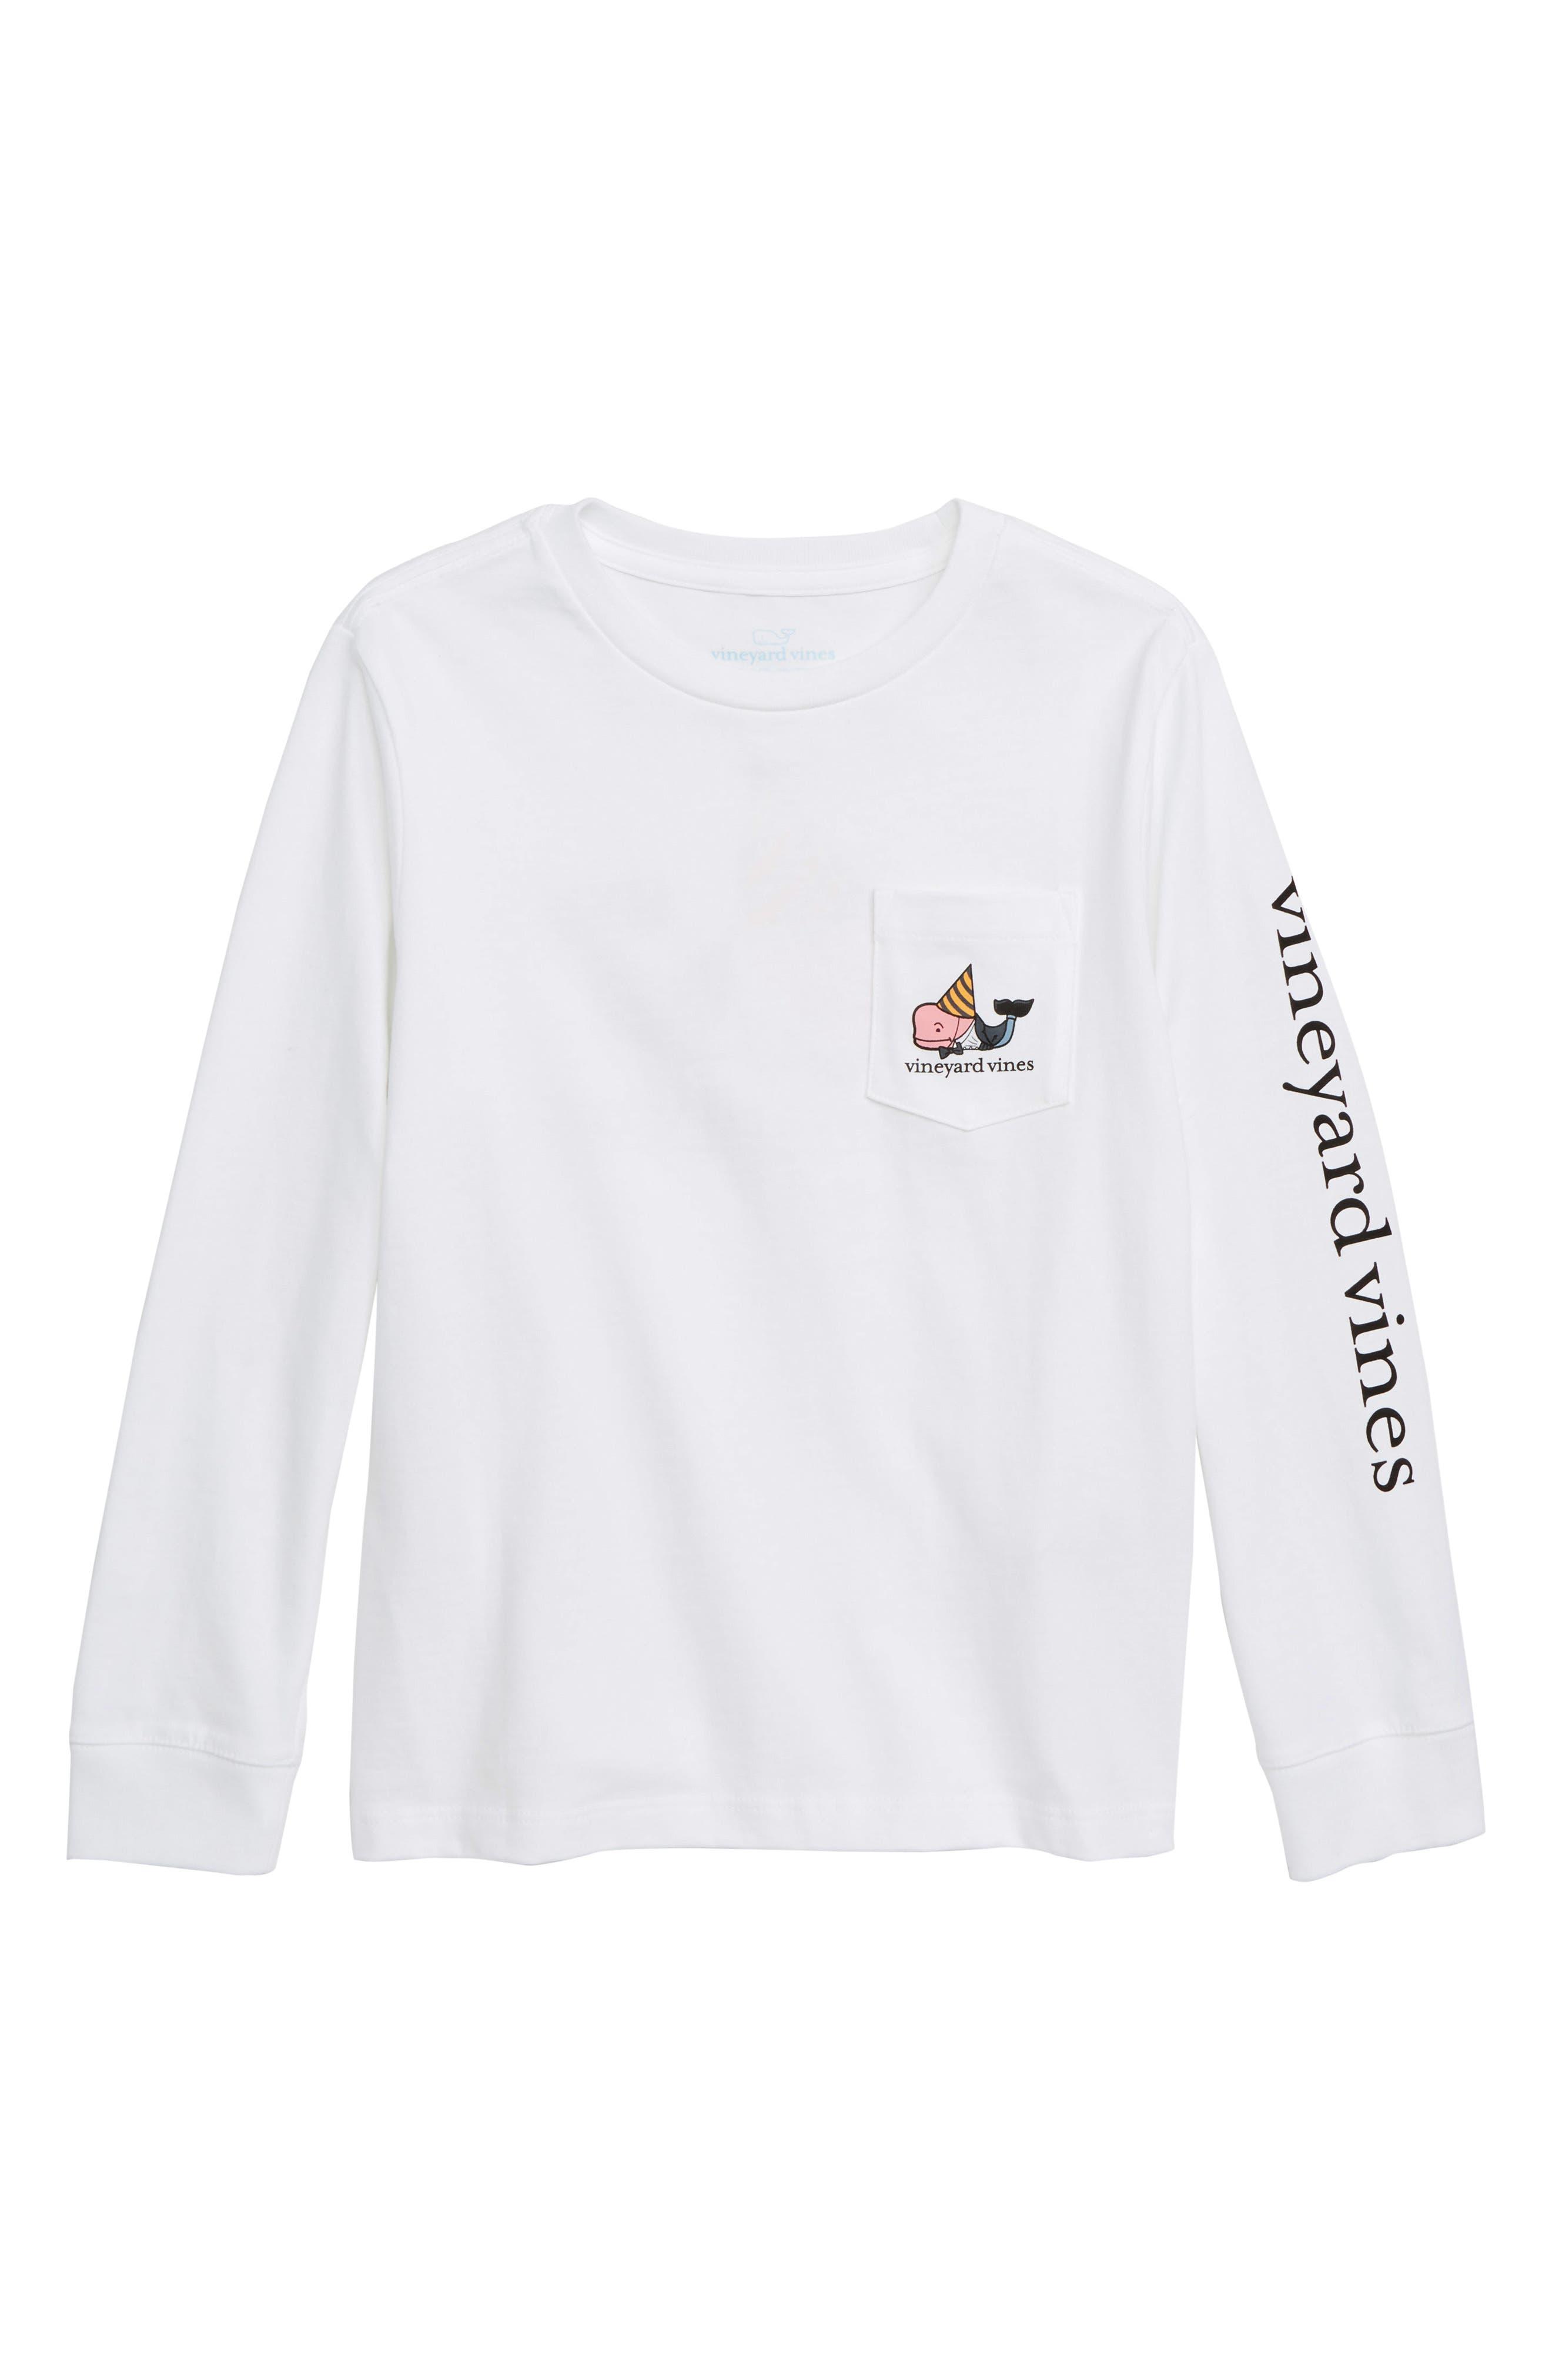 Dapper New Years Pocket T-Shirt,                             Main thumbnail 1, color,                             WHITE CAP